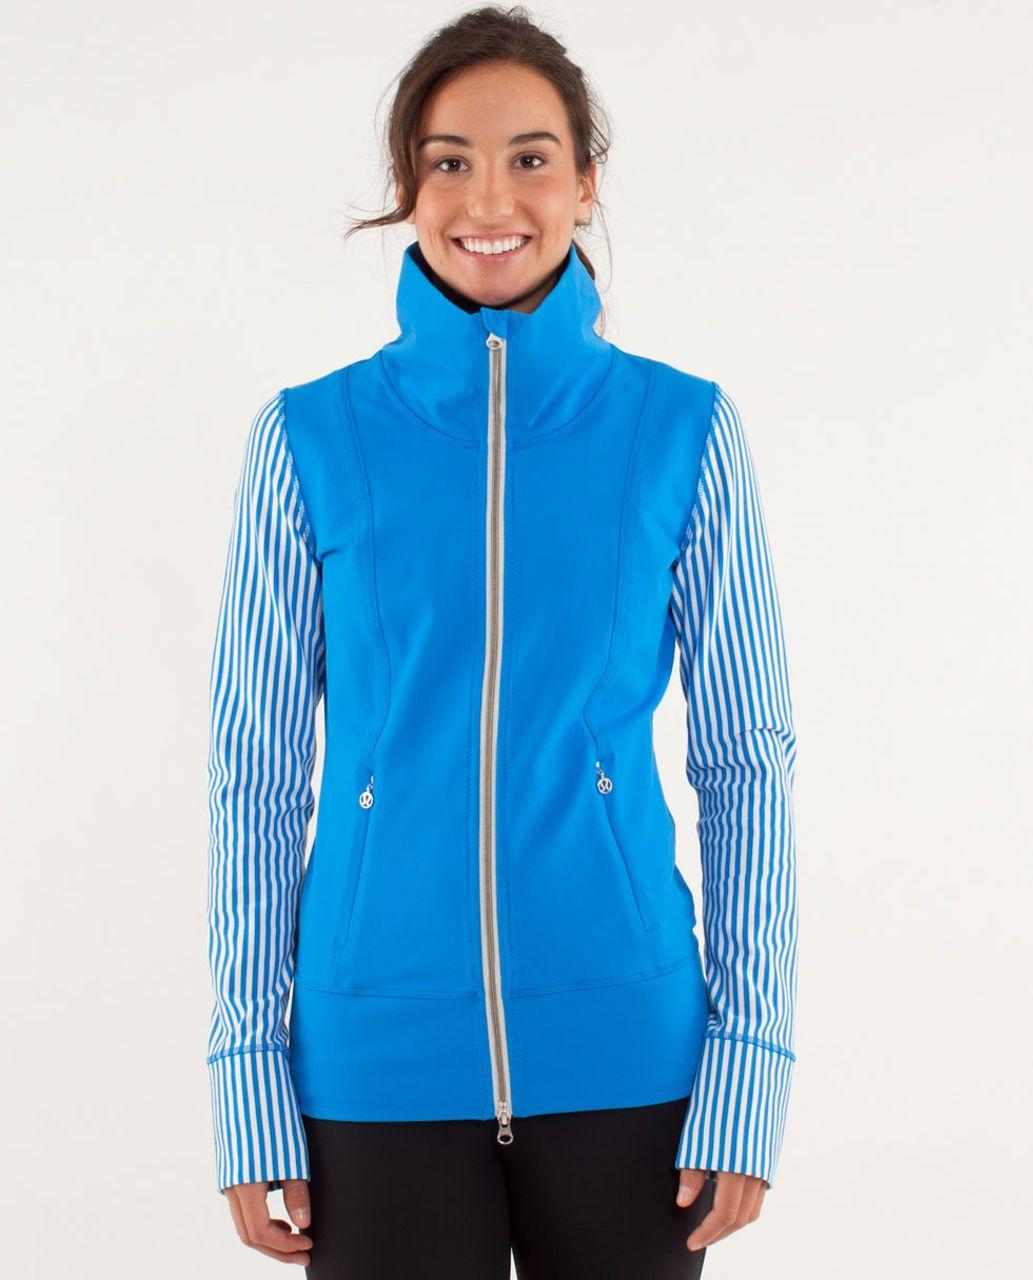 496f98c42b Lululemon Daily Yoga Jacket - Beaming Blue / Classic Stripe Polar Cream  Beaming Blue - lulu fanatics